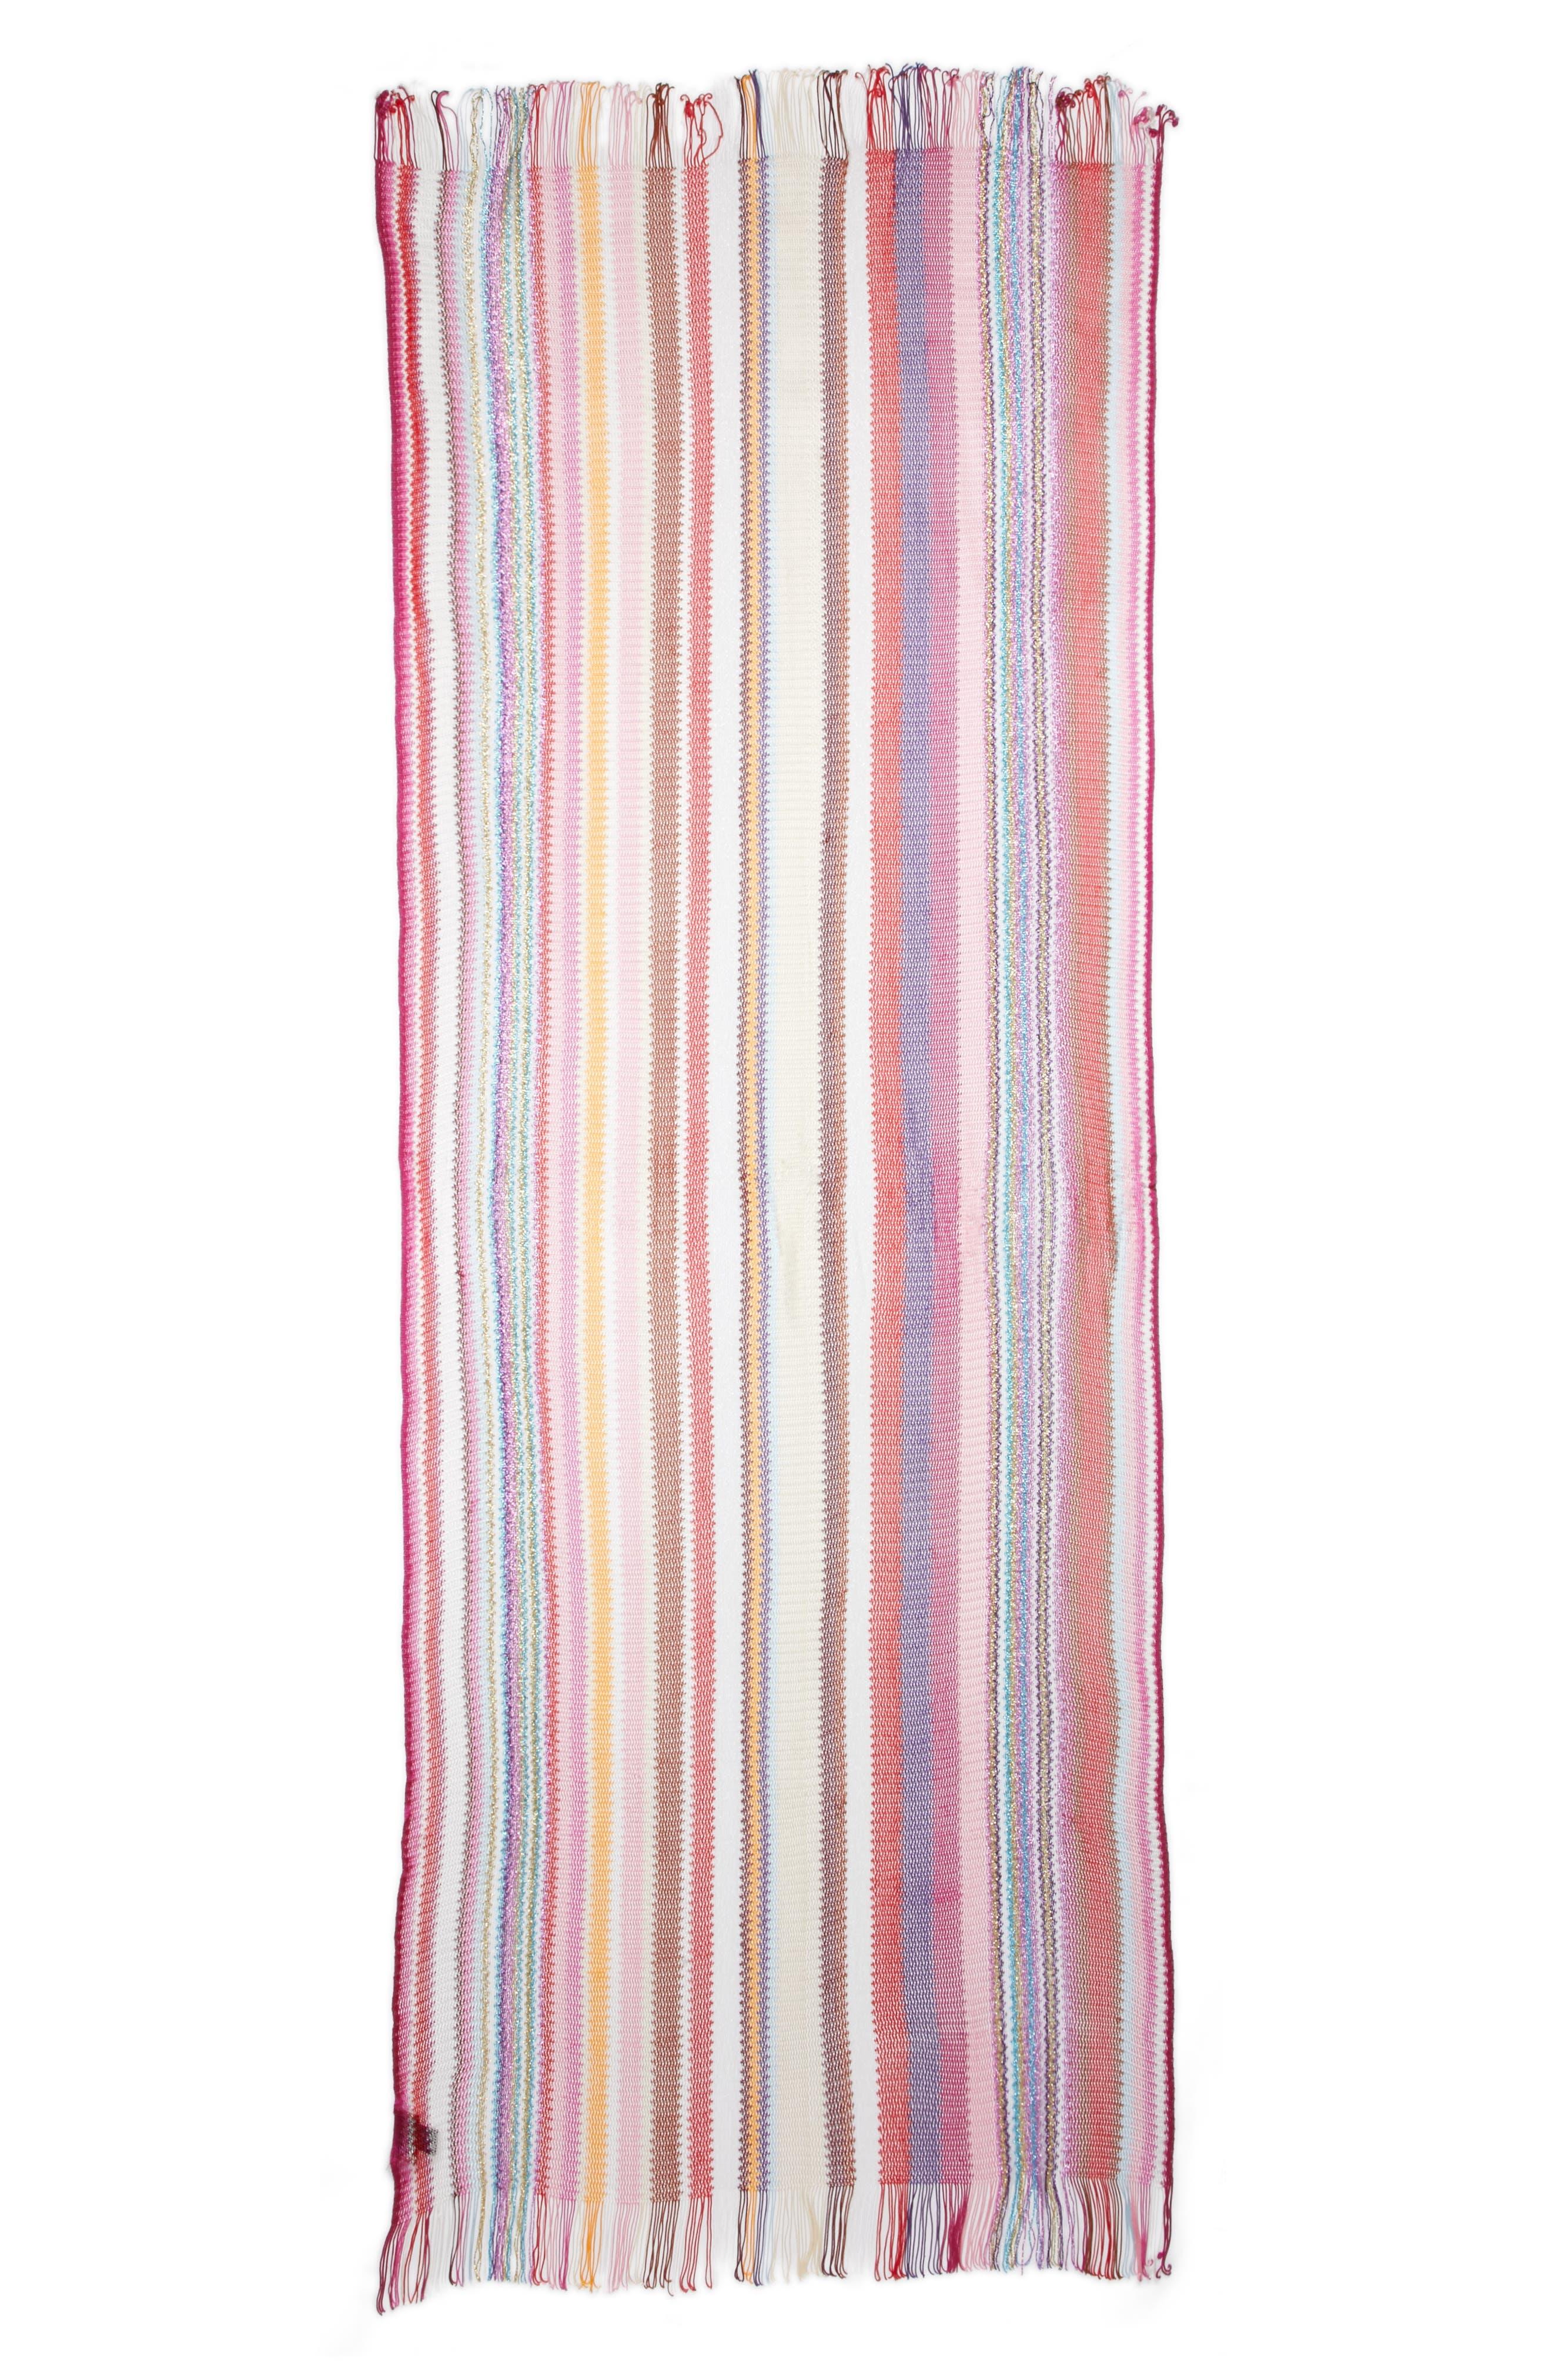 Zigzag Stripe Stole,                         Main,                         color, MULTI PINK